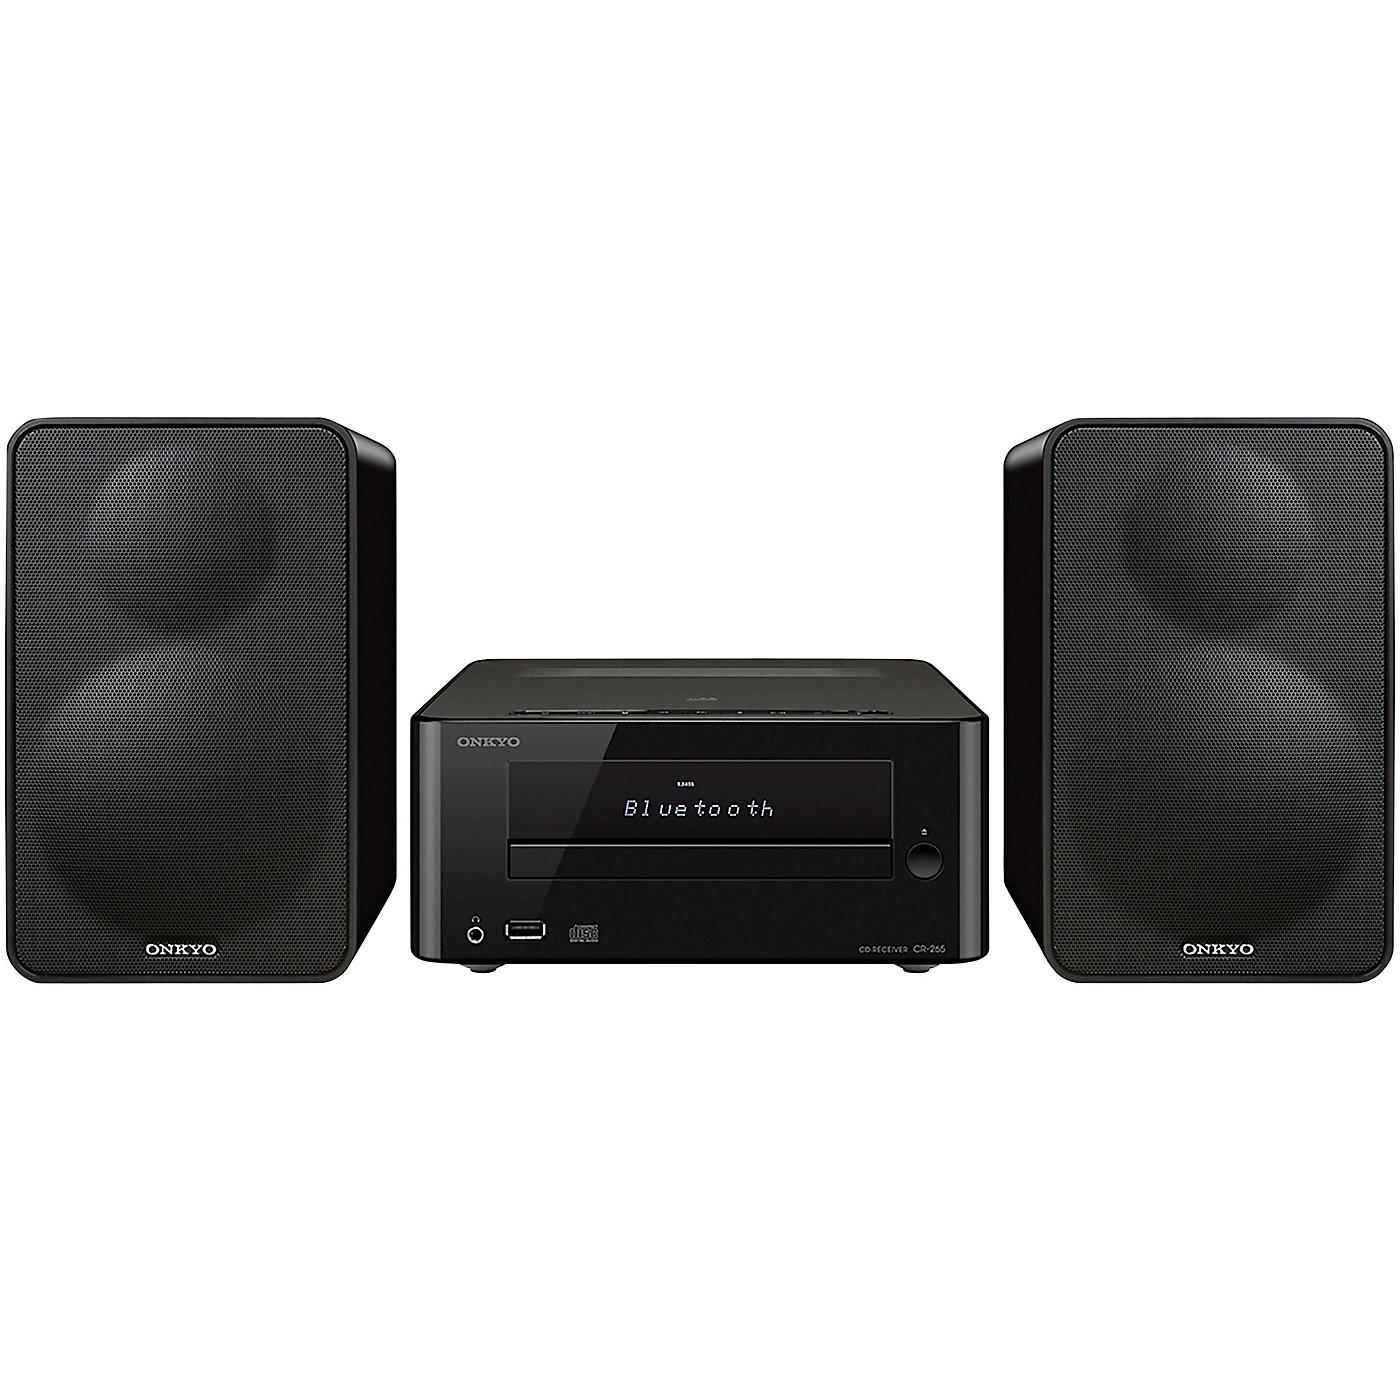 Onkyo Colibrino CD Hi-Fi Mini System with Bluetooth thumbnail